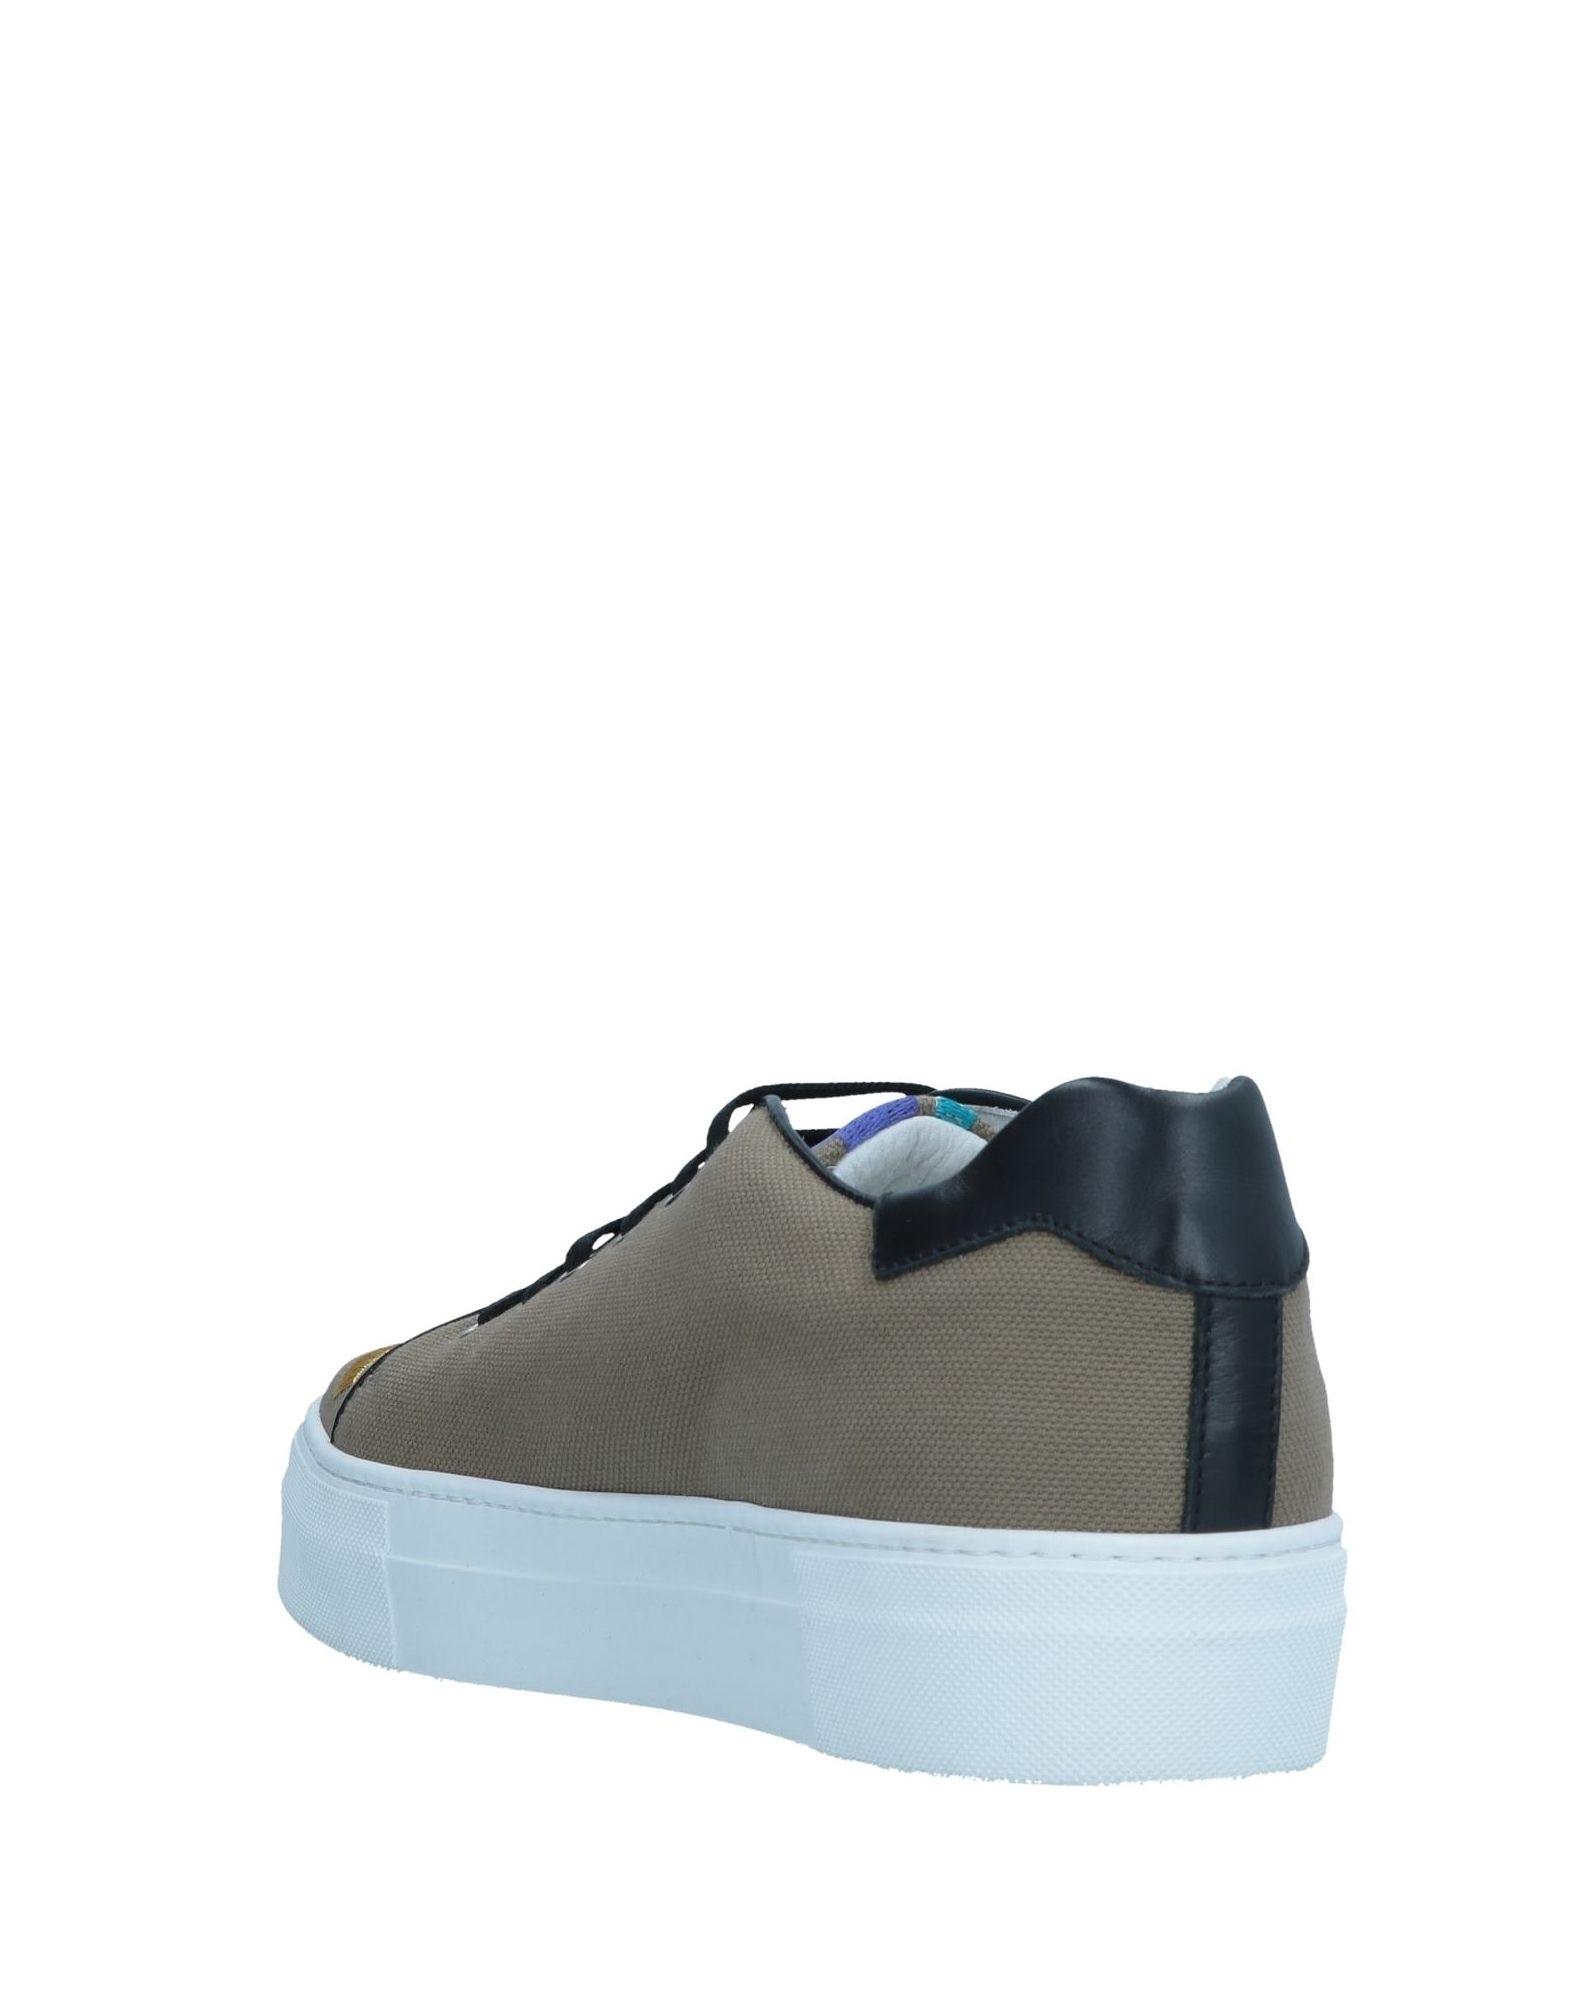 Stilvolle billige Schuhe Simon 11543410GB Scott Sneakers Damen  11543410GB Simon 881279